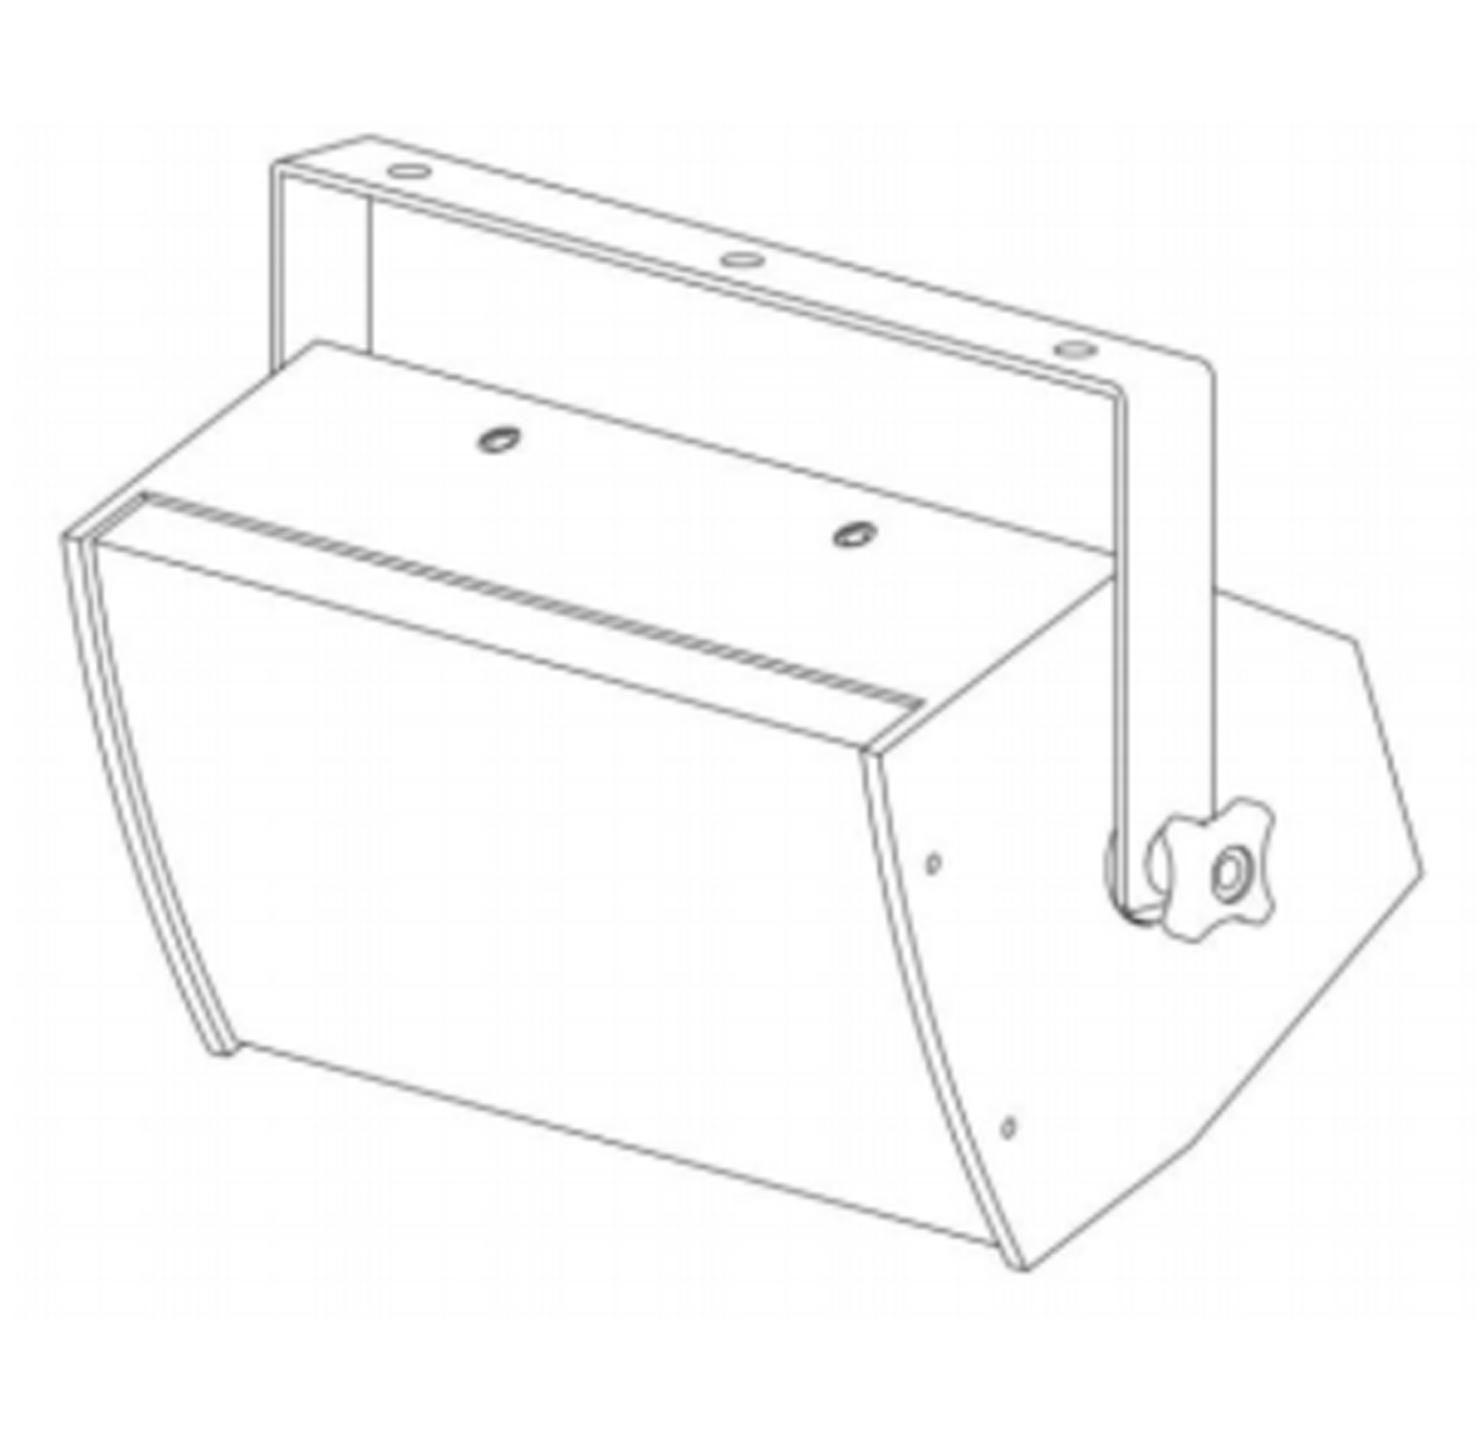 EM Acoustics EMS-61 - Horizontal Hanging Bracket